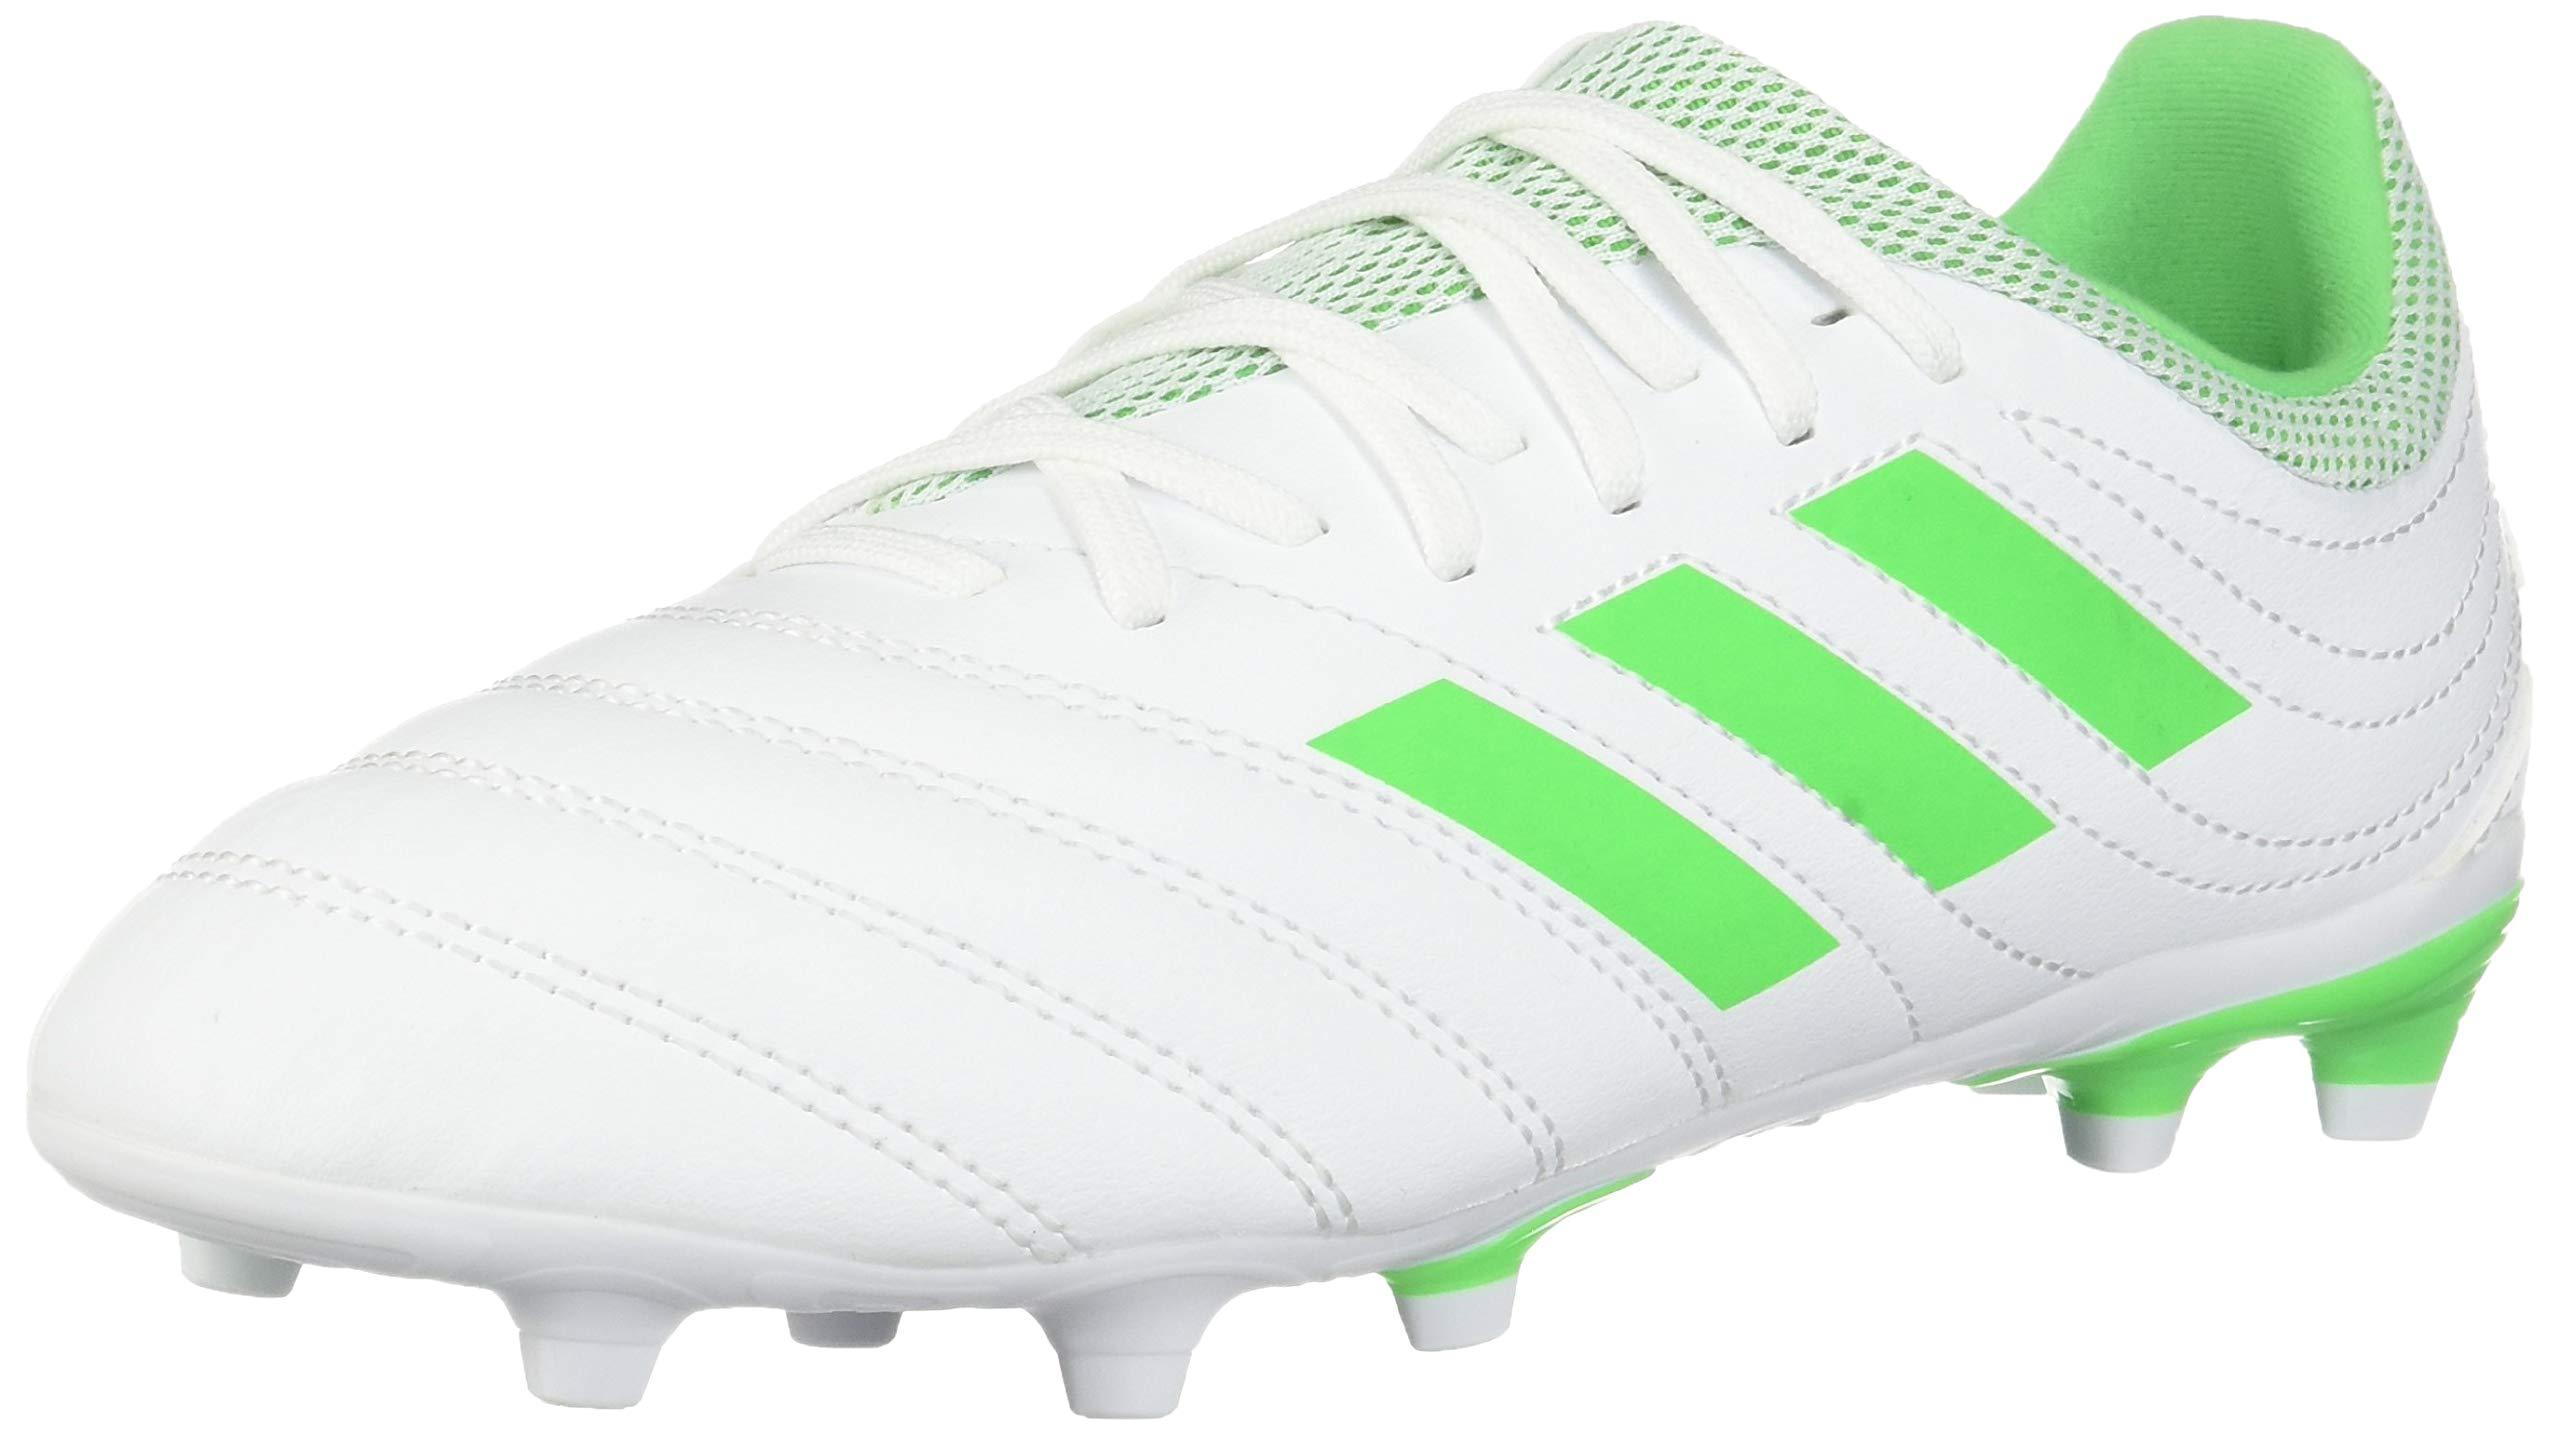 adidas Unisex Copa 19.3 Firm Ground Soccer Shoe, Solar Lime/White, 12.5K M US Little Kid